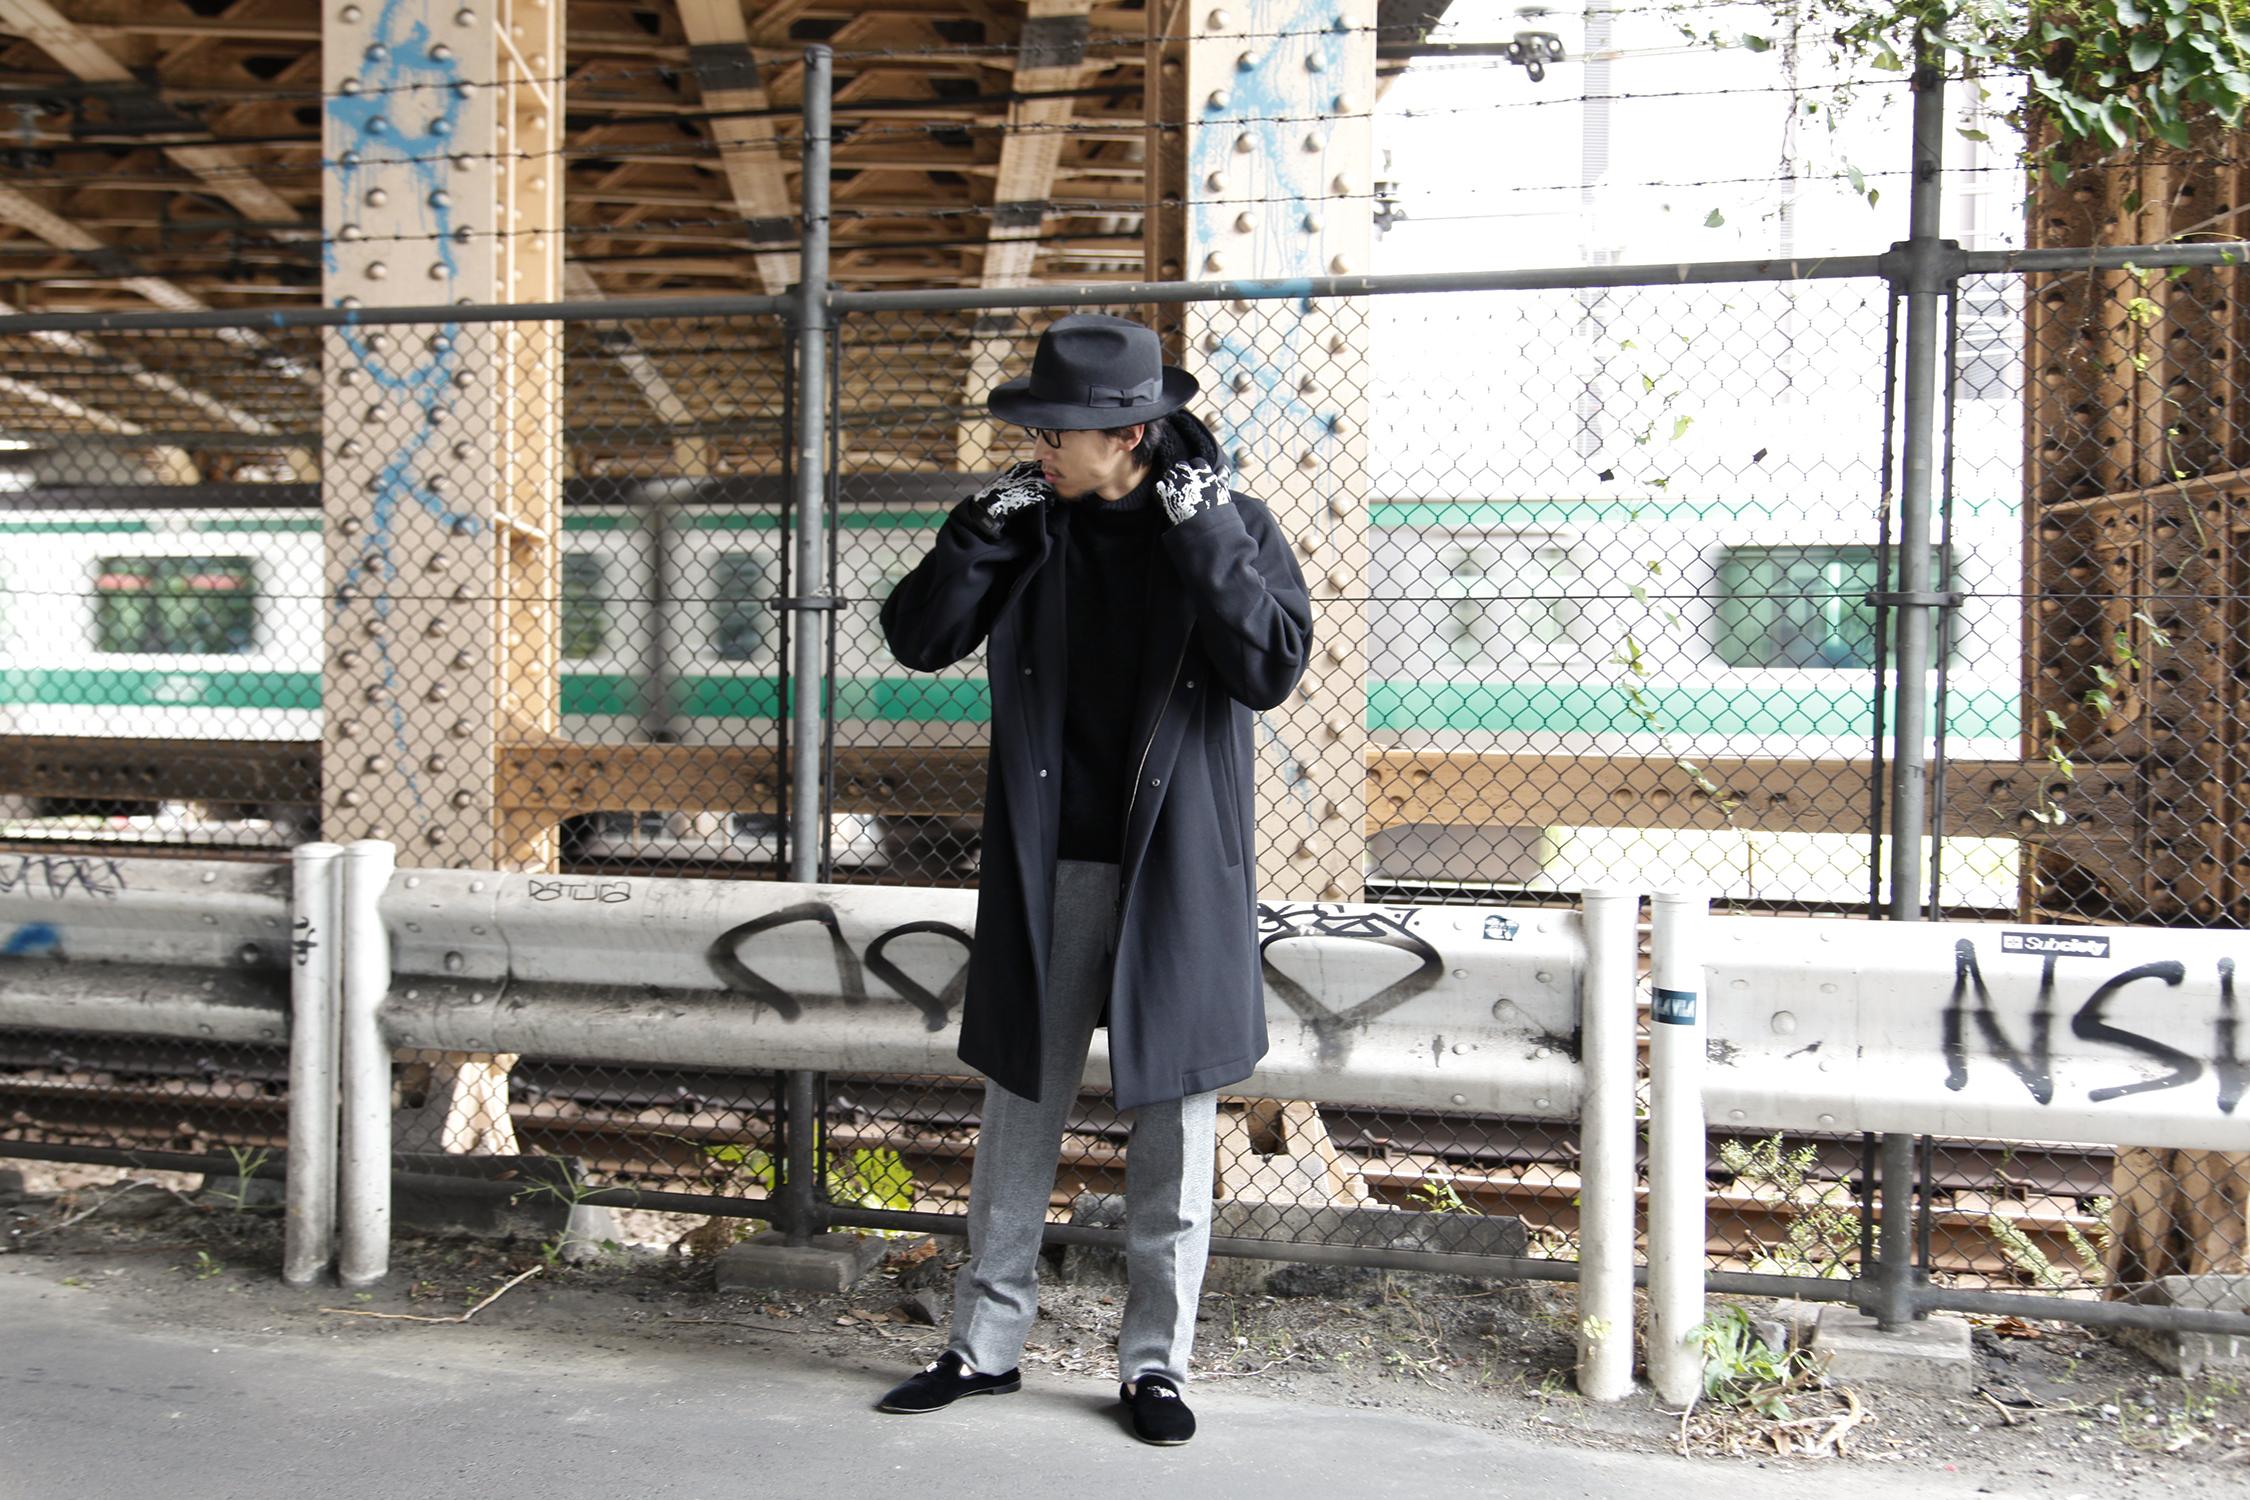 CK_Daichi Miura_9